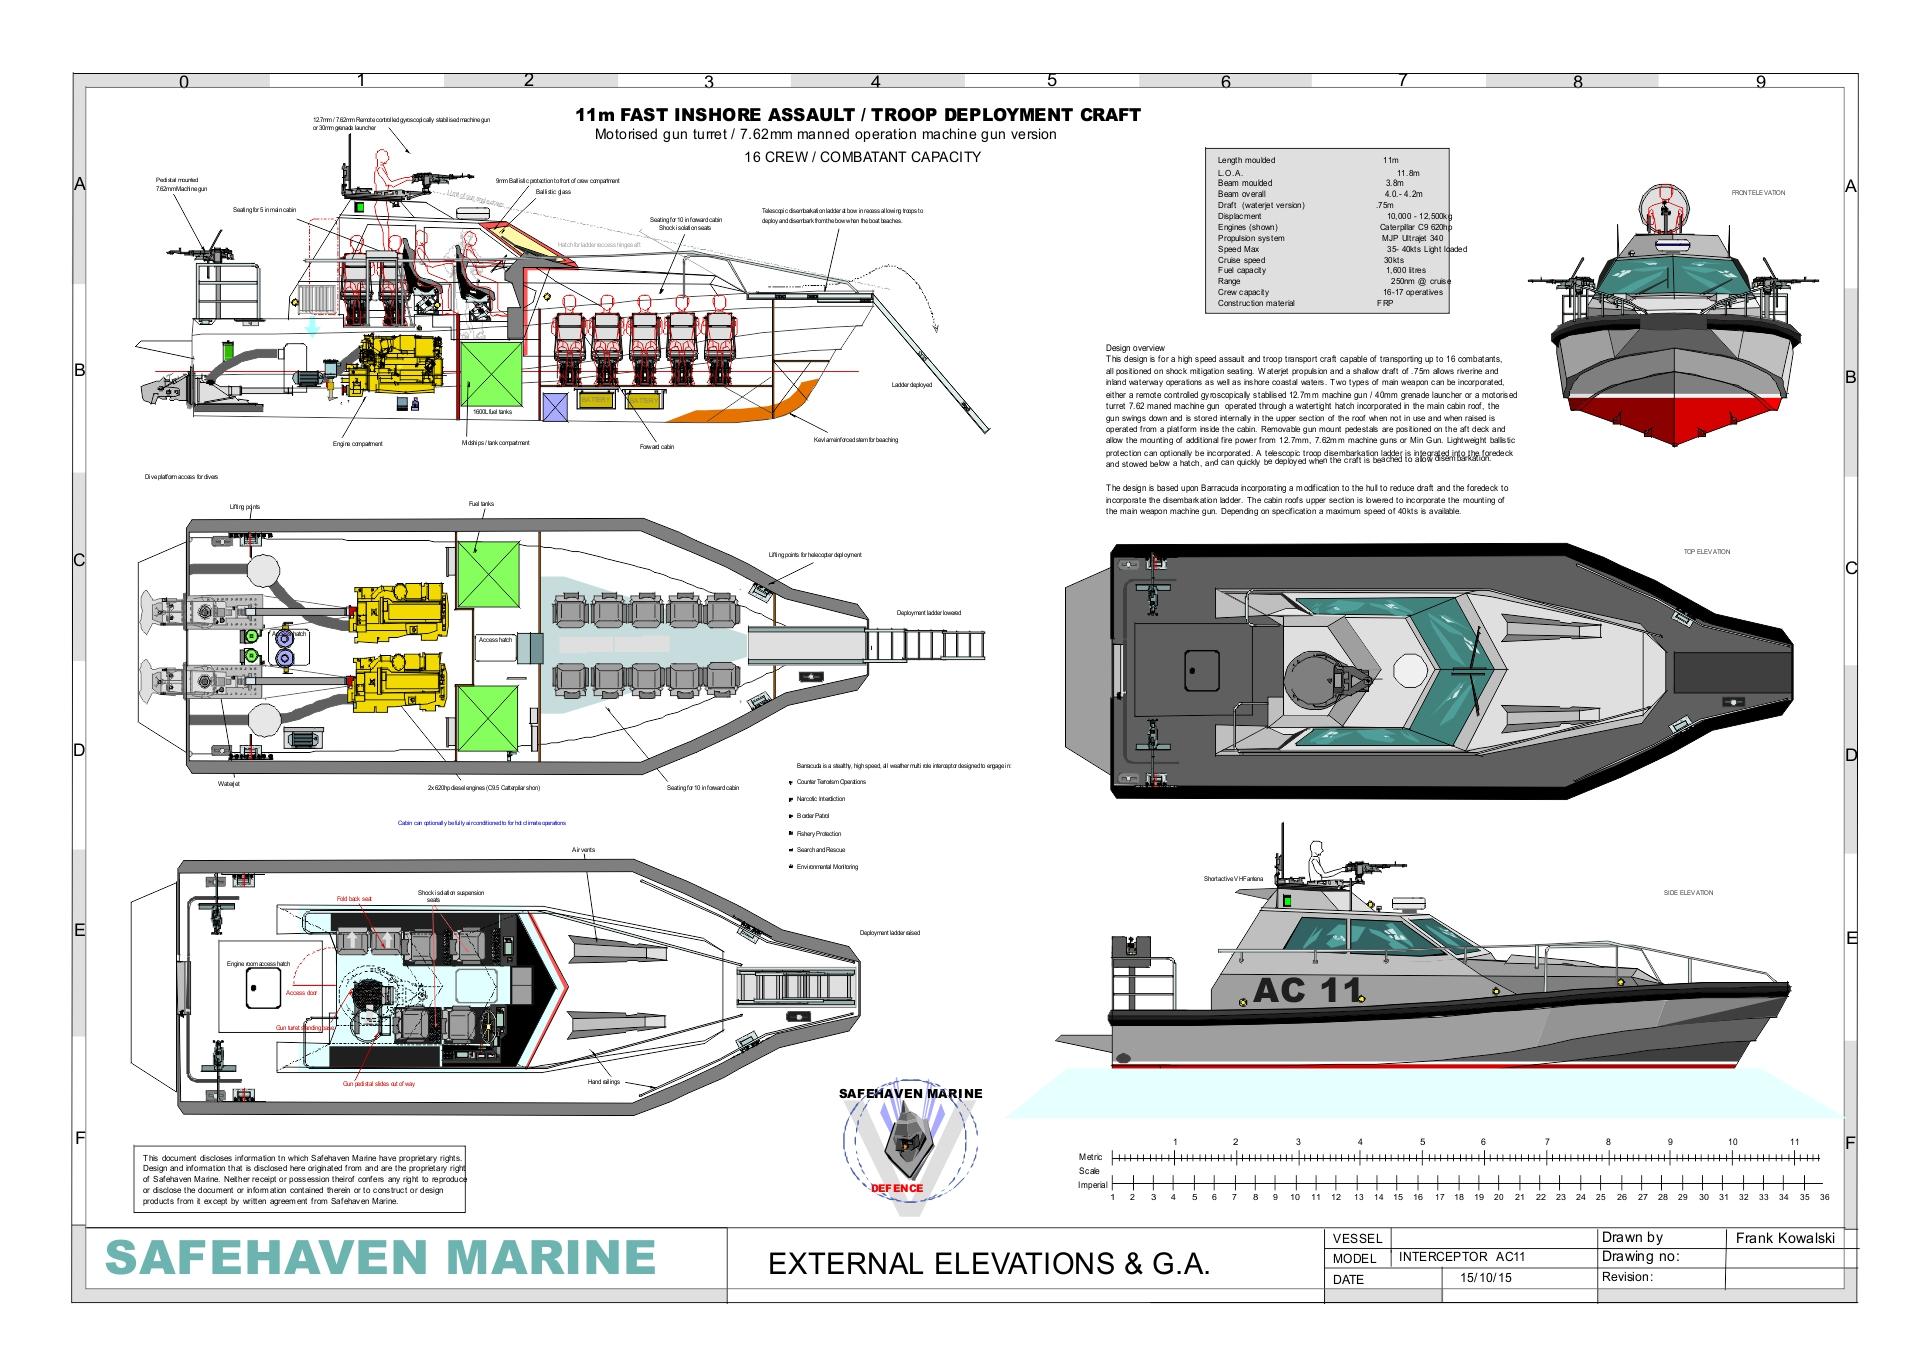 Barracuda, 11m Riverine assault